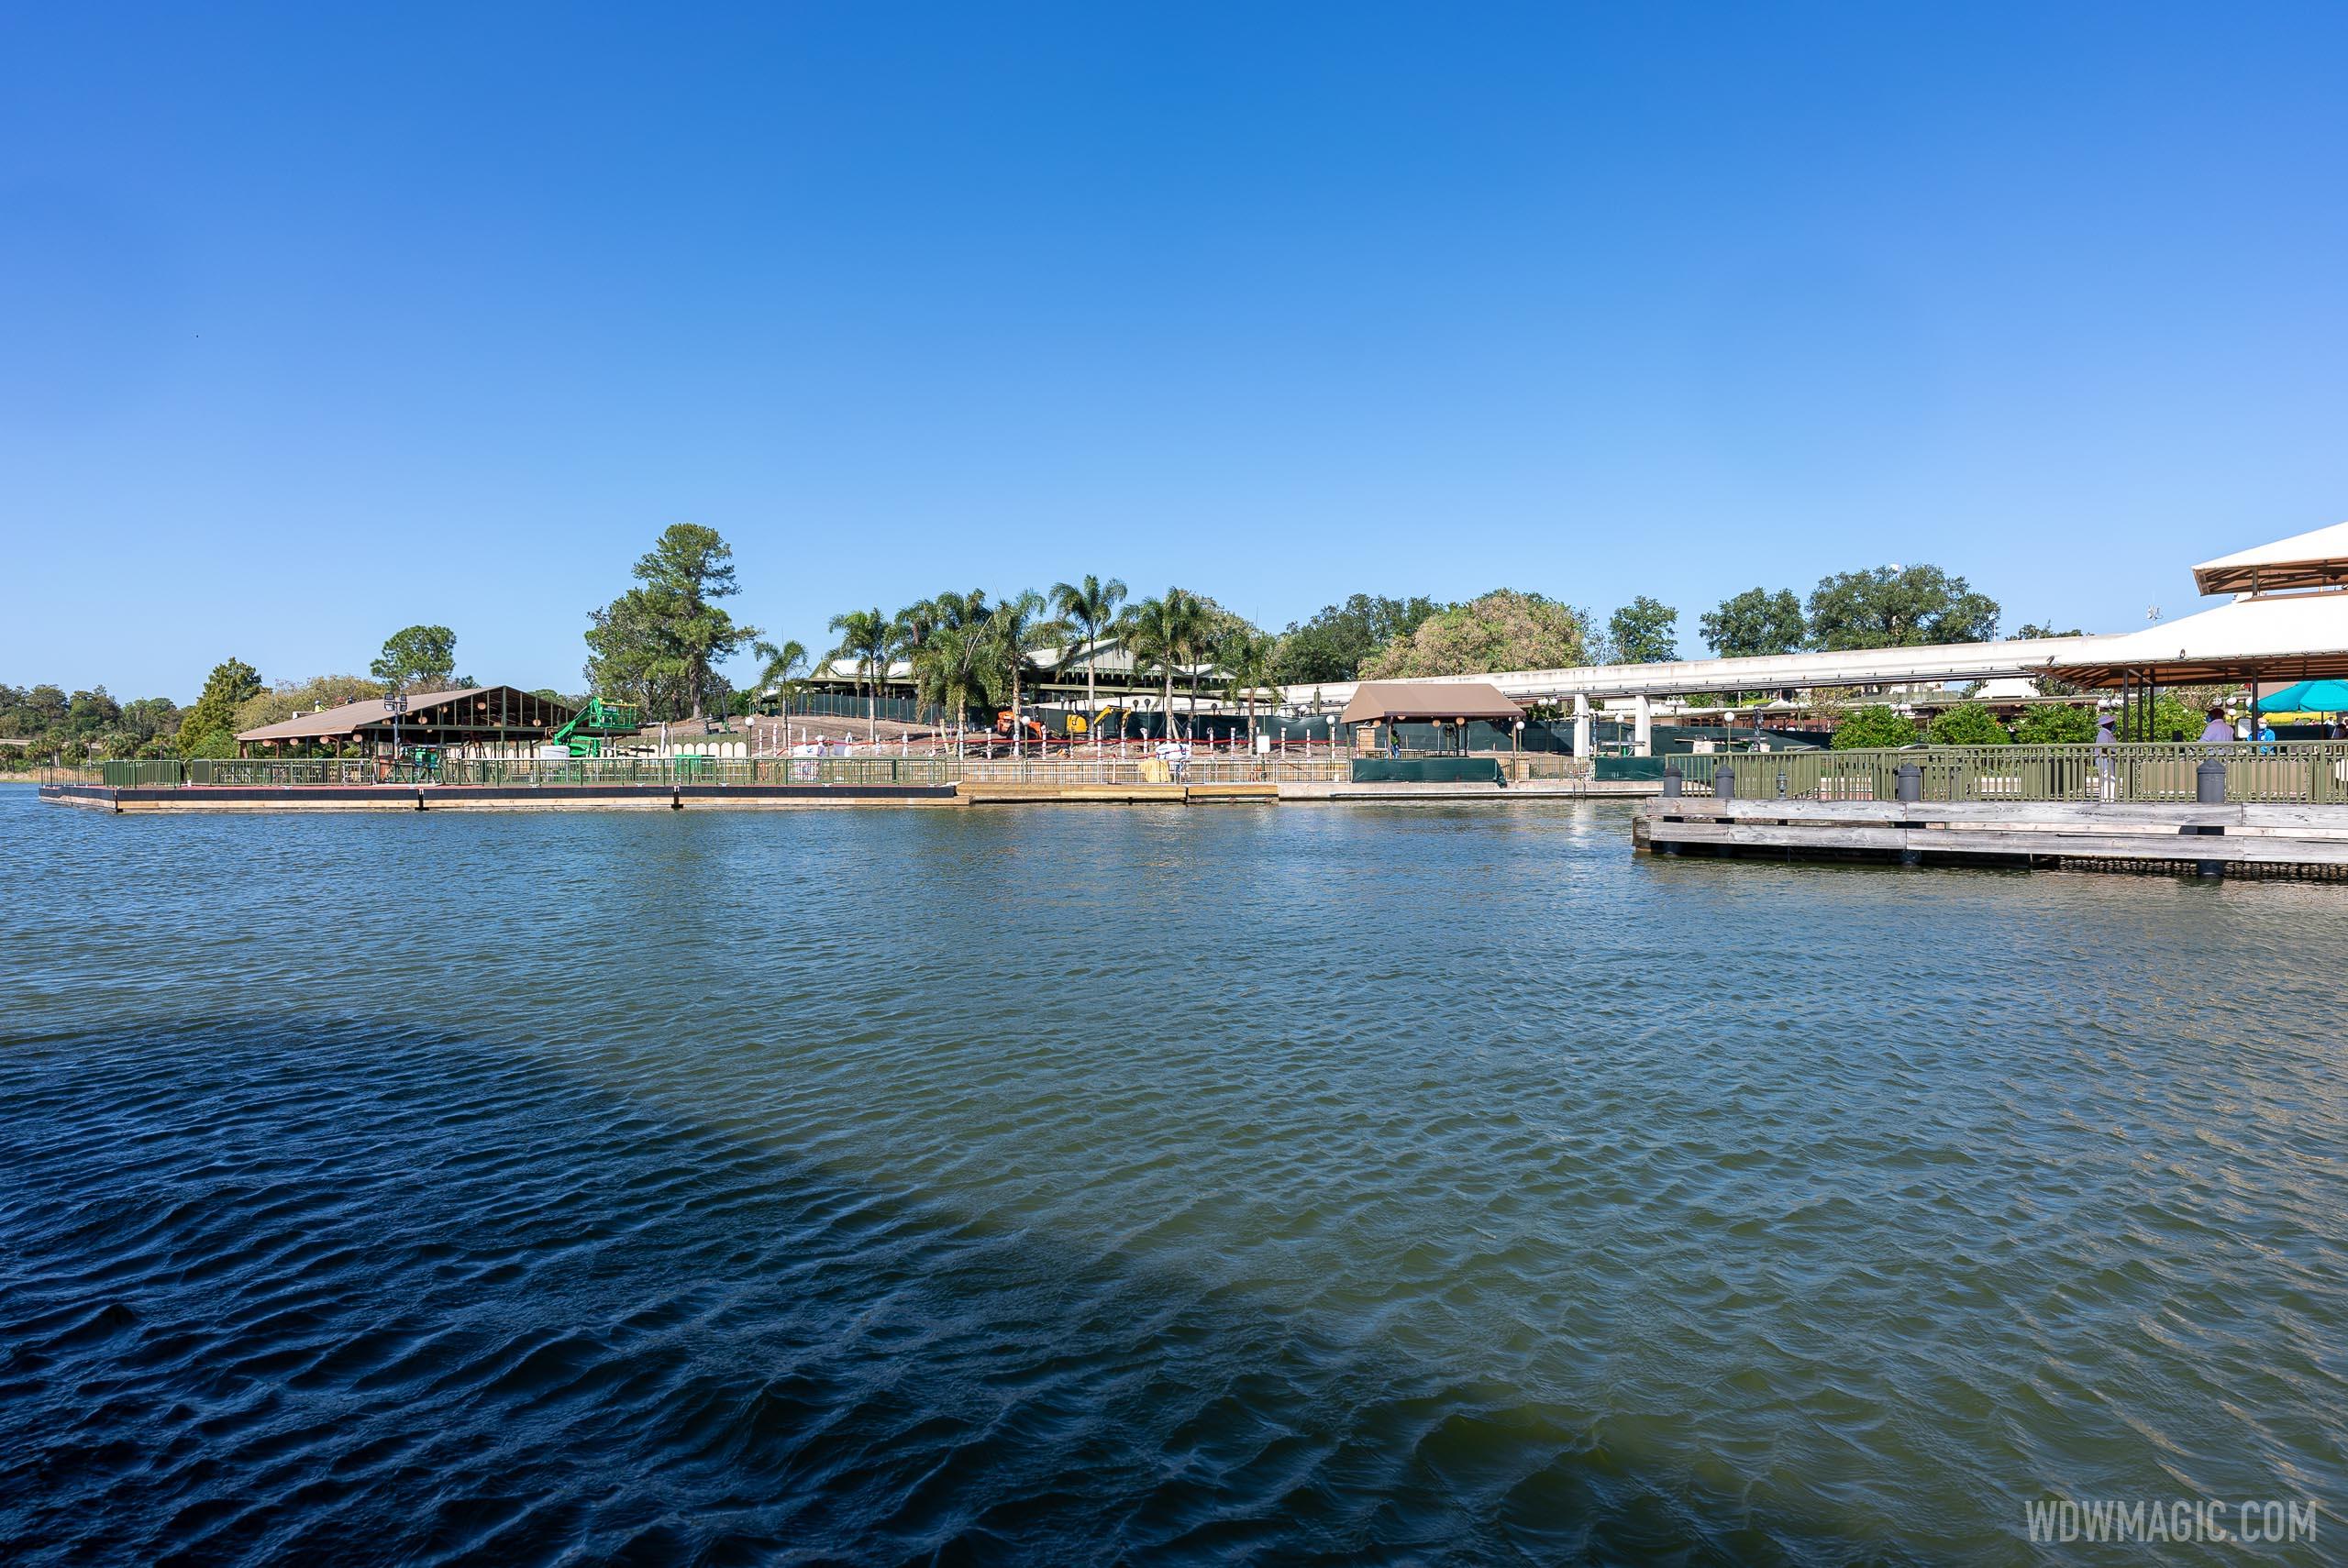 Grand Floridian to Magic Kingdom bridge construction - November 2 2020